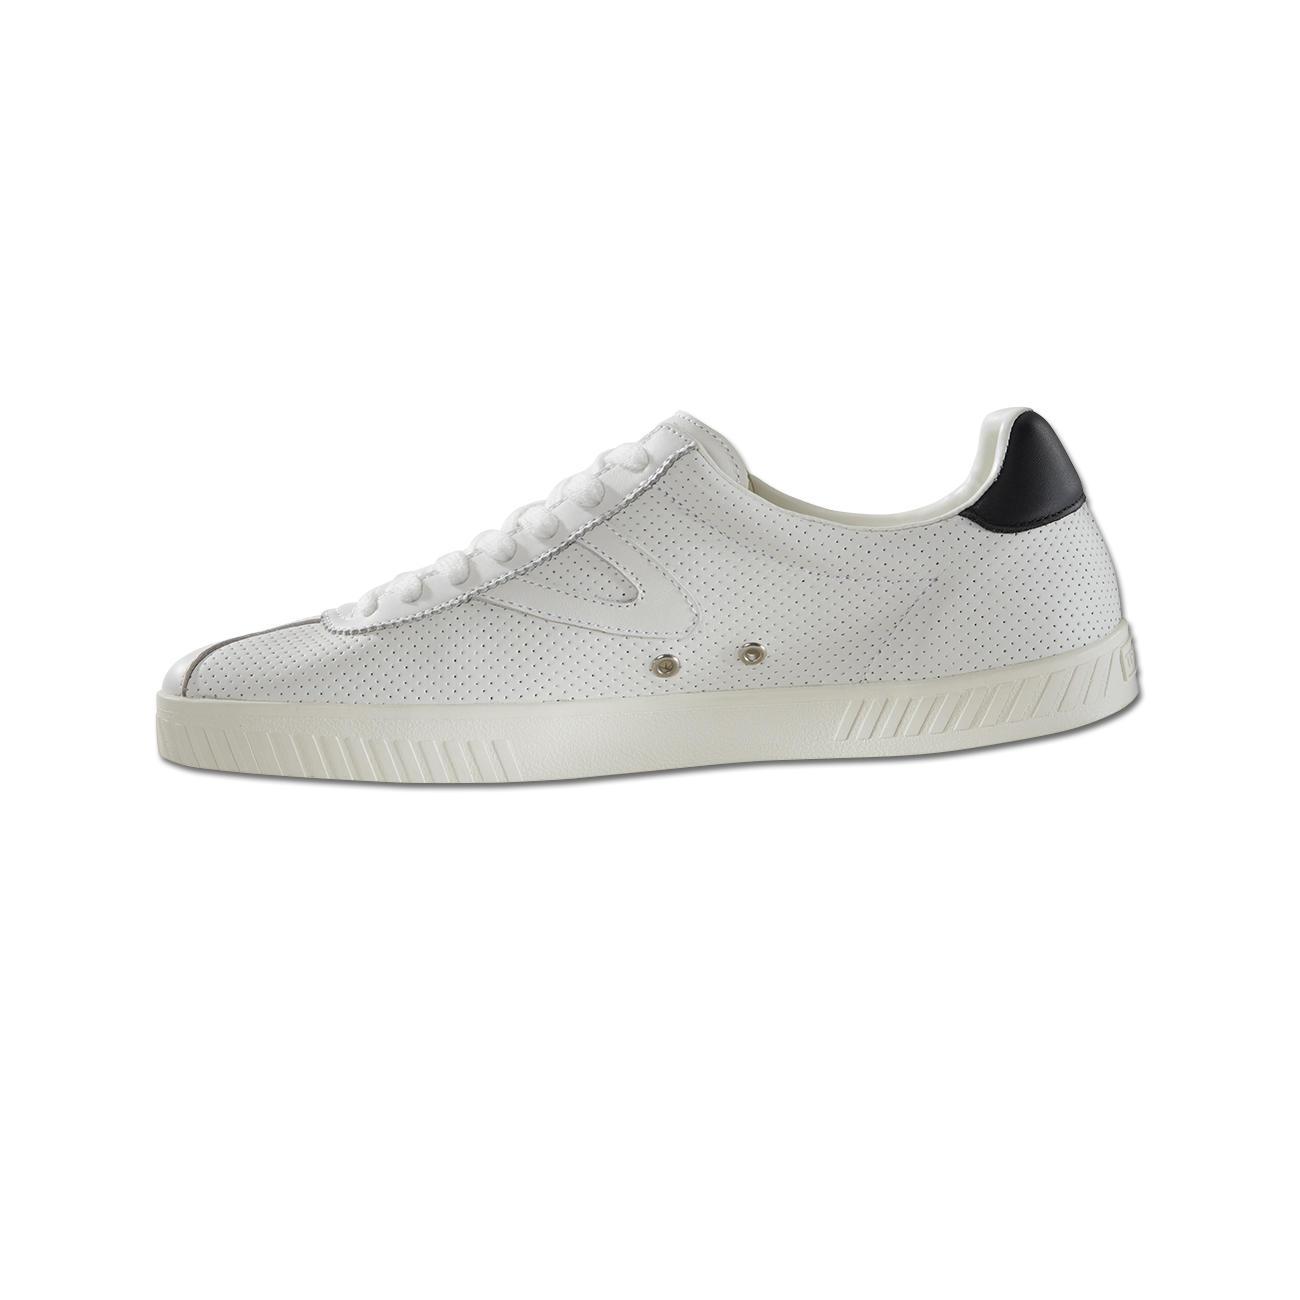 Chaussures Tretorn blanches Fashion femme Levis Chaussures 225797 Levis soldes Chaussures Tretorn blanches Fashion femme Gabor Chaussures DINSE Gabor soldes v6ydPiQr